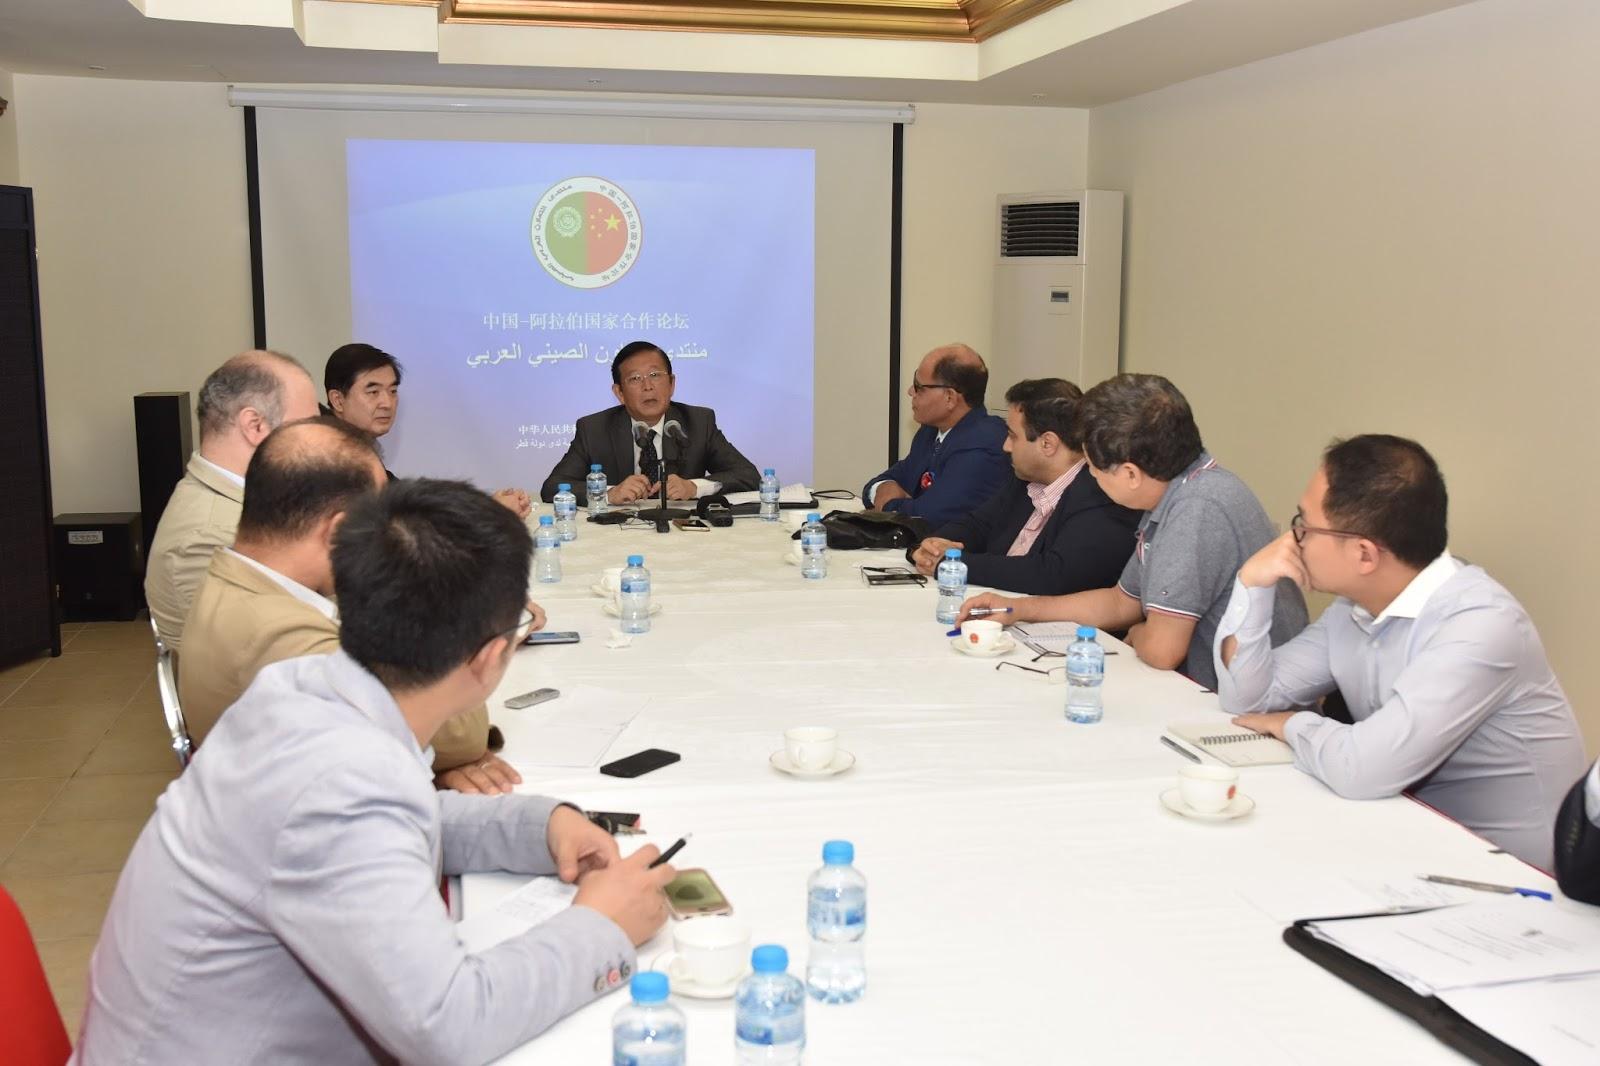 3bacbbbee سفير الصين لشؤون منتدى التعاون العربي - الصيني: مشاركة قطر بمبادرة